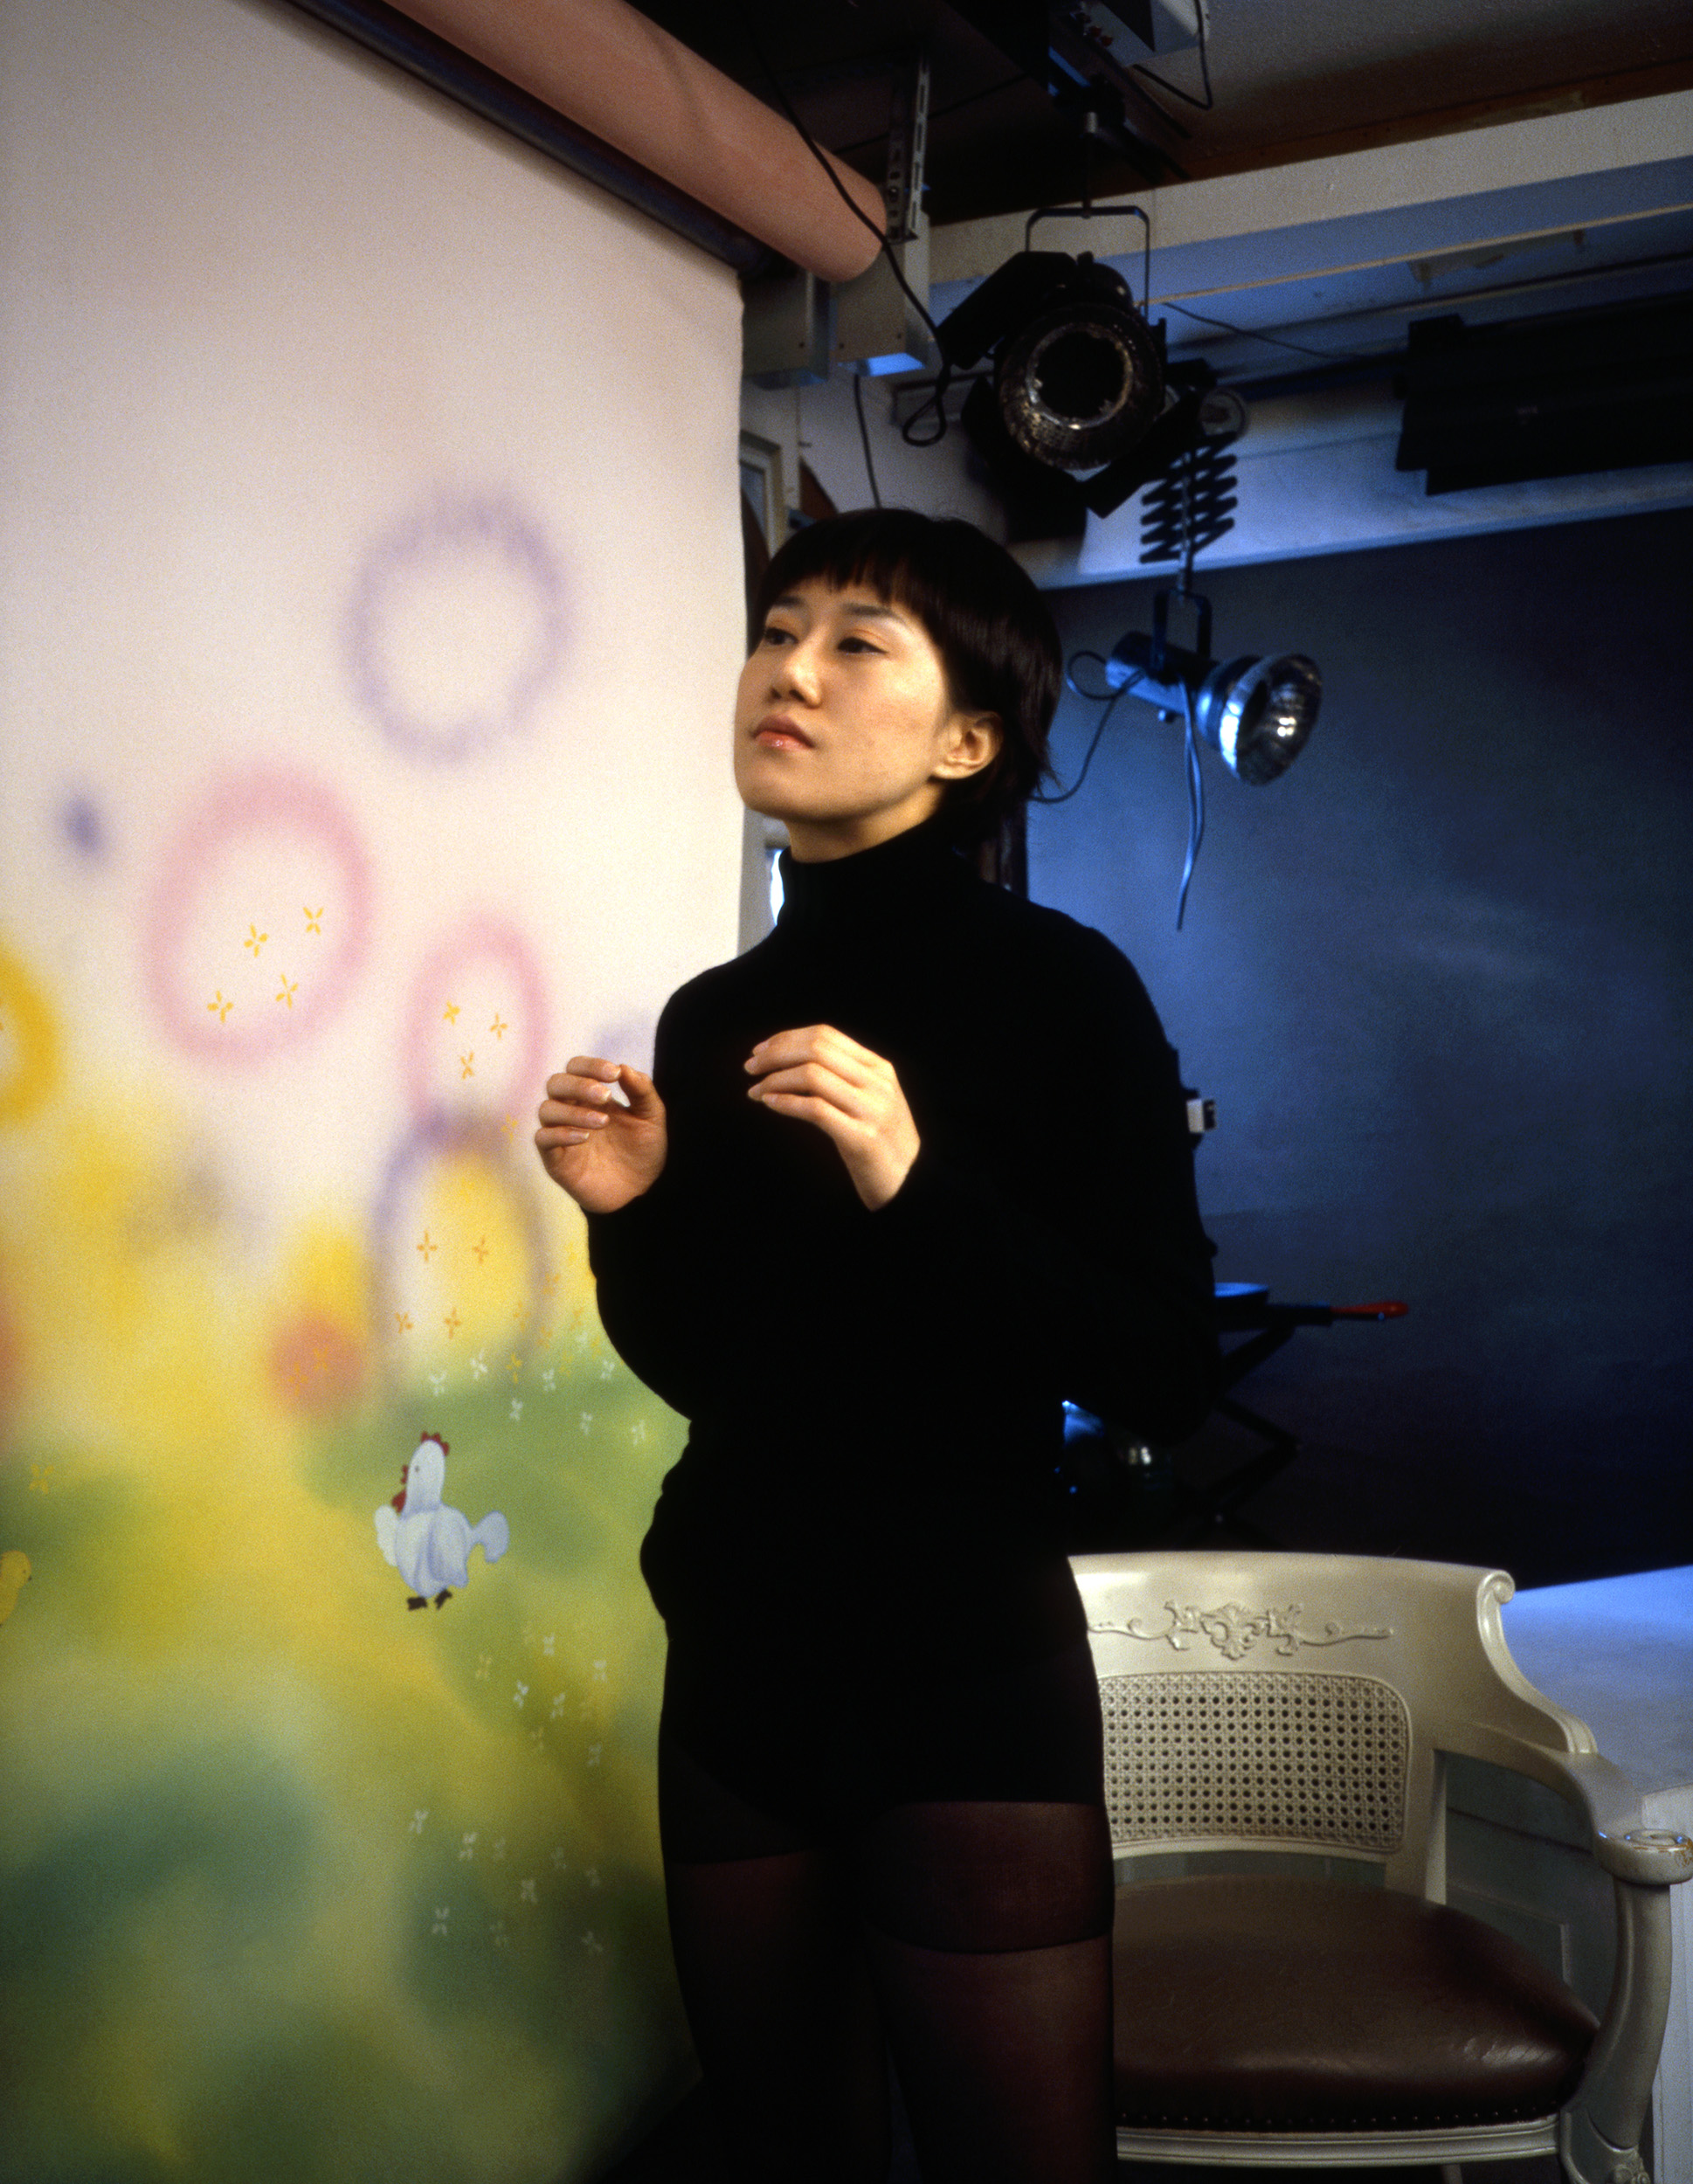 Untitled Production Still (Girlfriend's Torso)  2005, colour photograph,76 x 58 cm / 30 x 23 in.